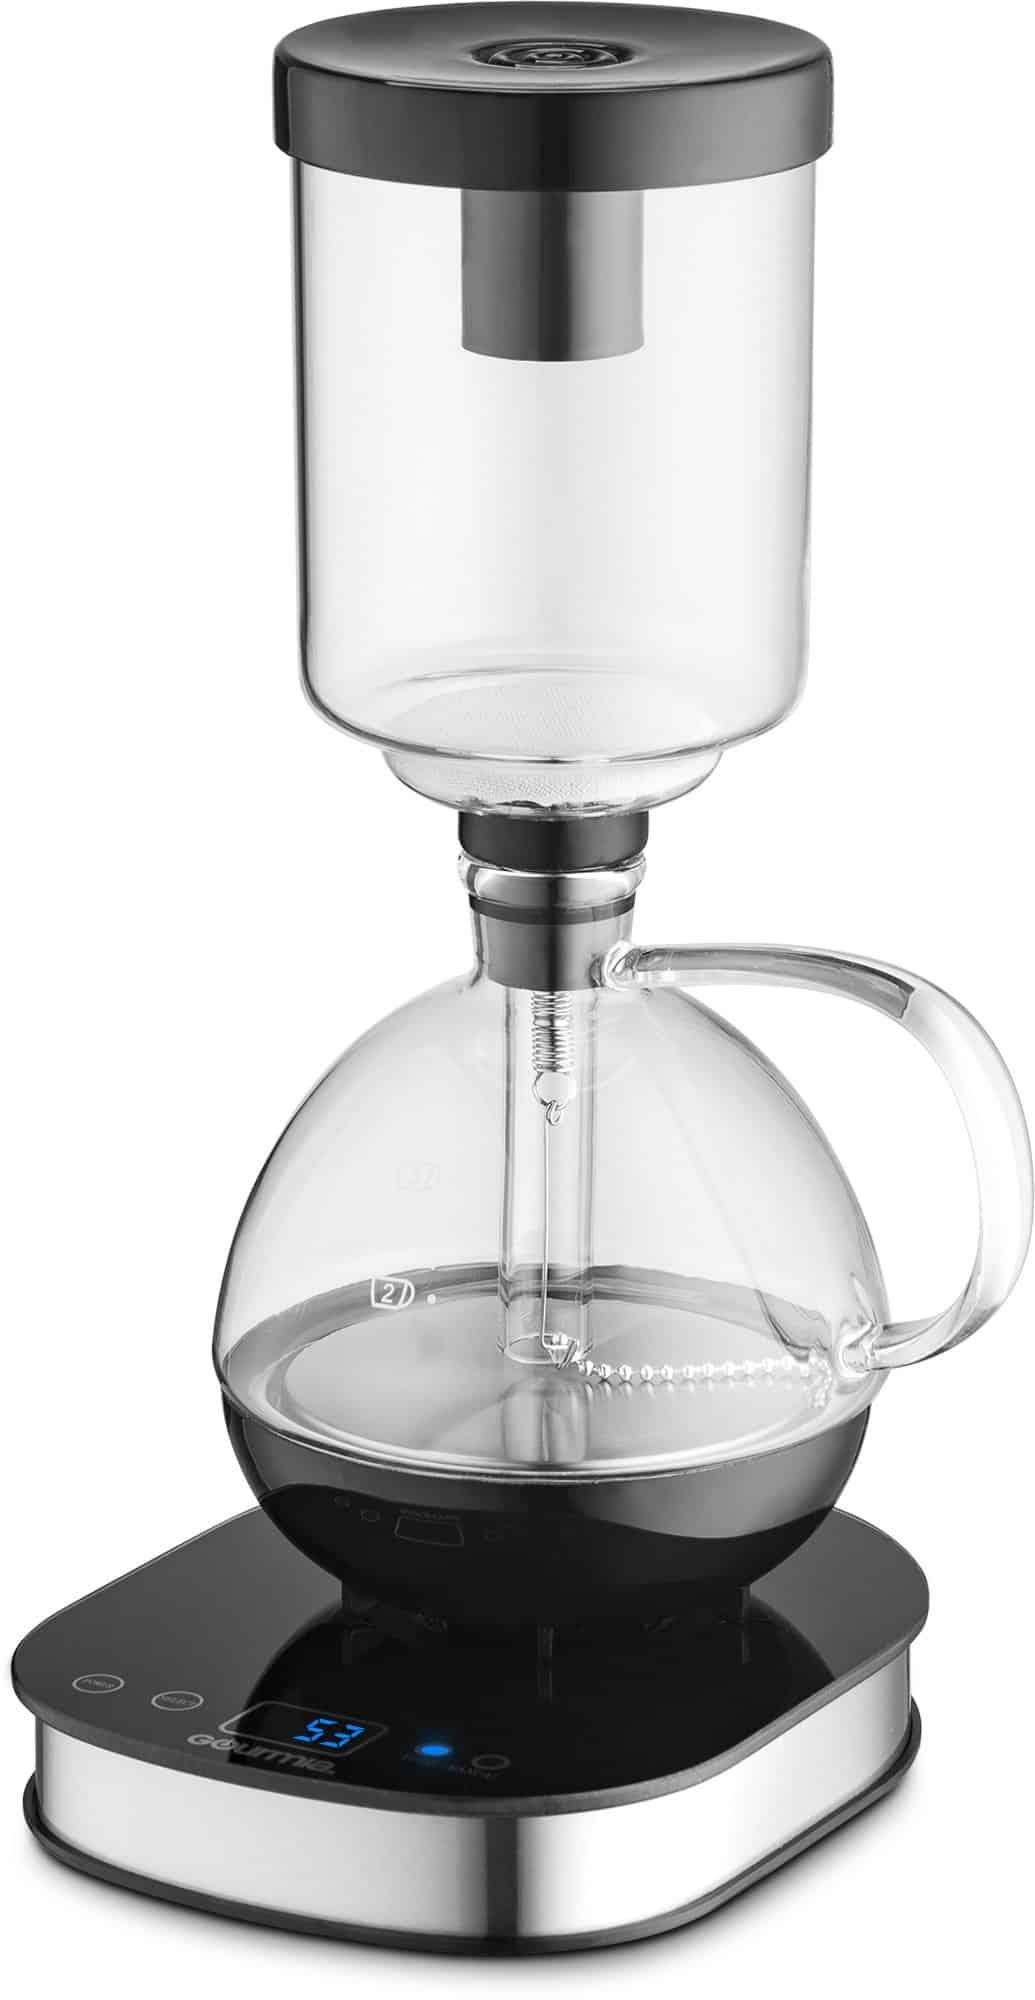 Gourmia Digital Siphon Artisanal Coffee Machine